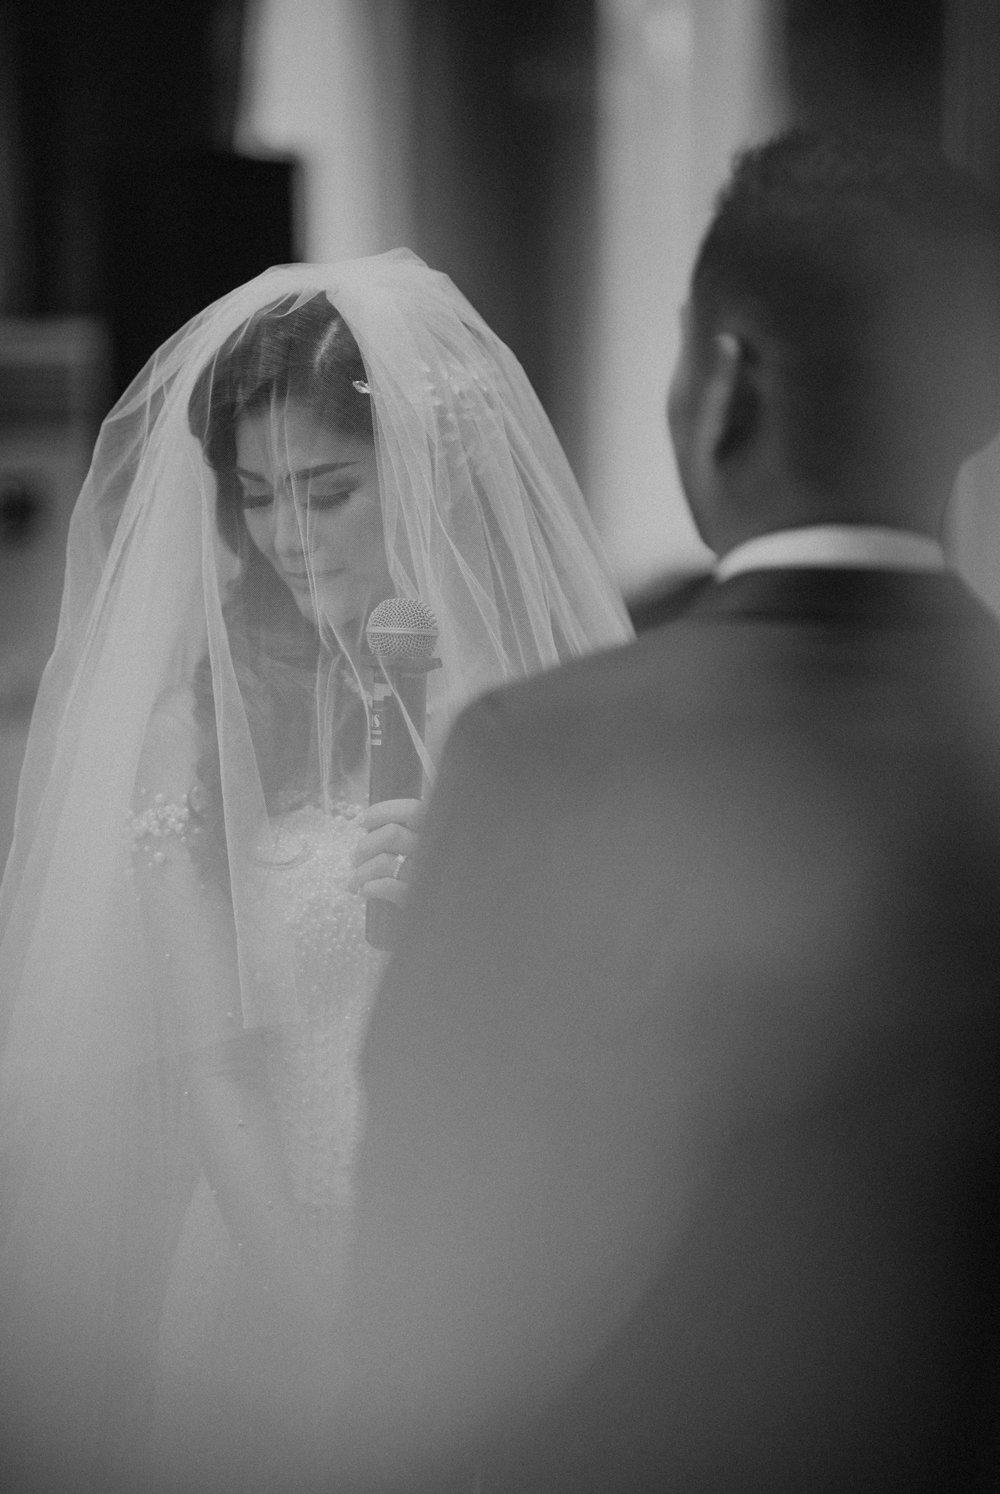 livia-reagan-wedding-raffles-jakarta-pyara-photo-gejoo 35.jpg